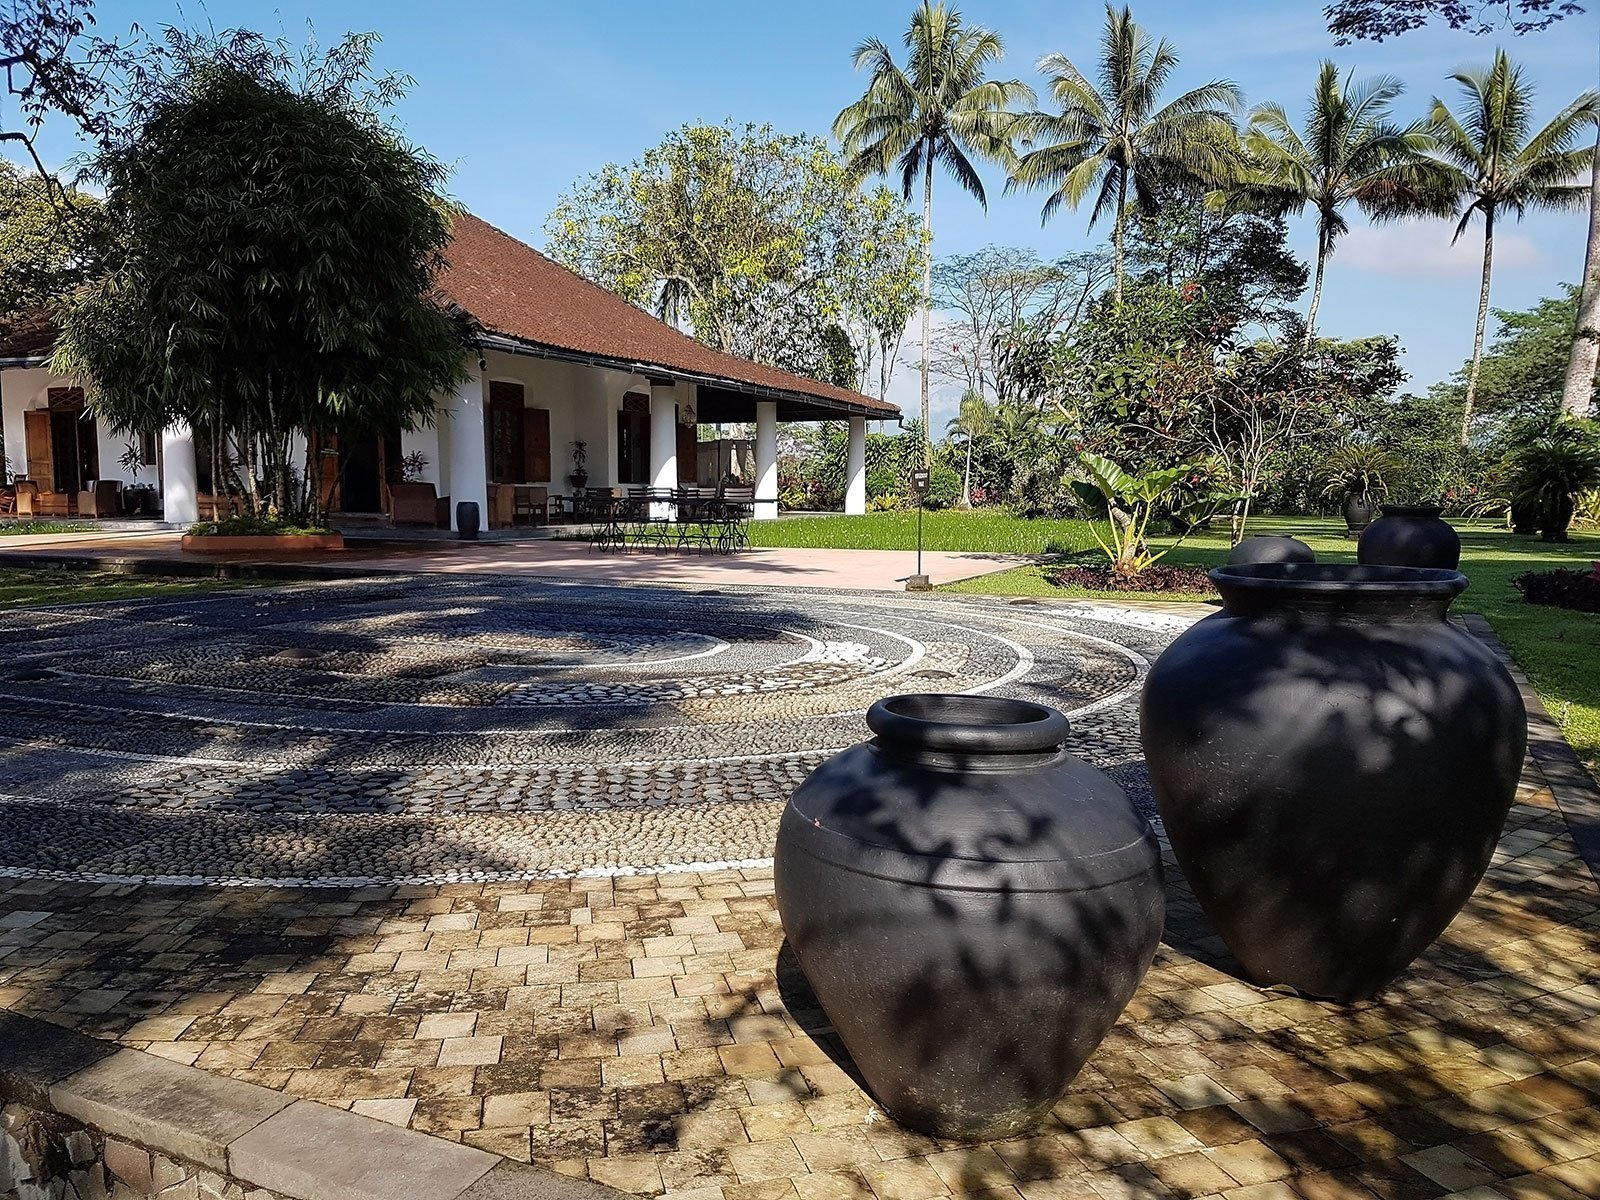 reisspecialist djordy smits favoriete hotel mesa stila resort